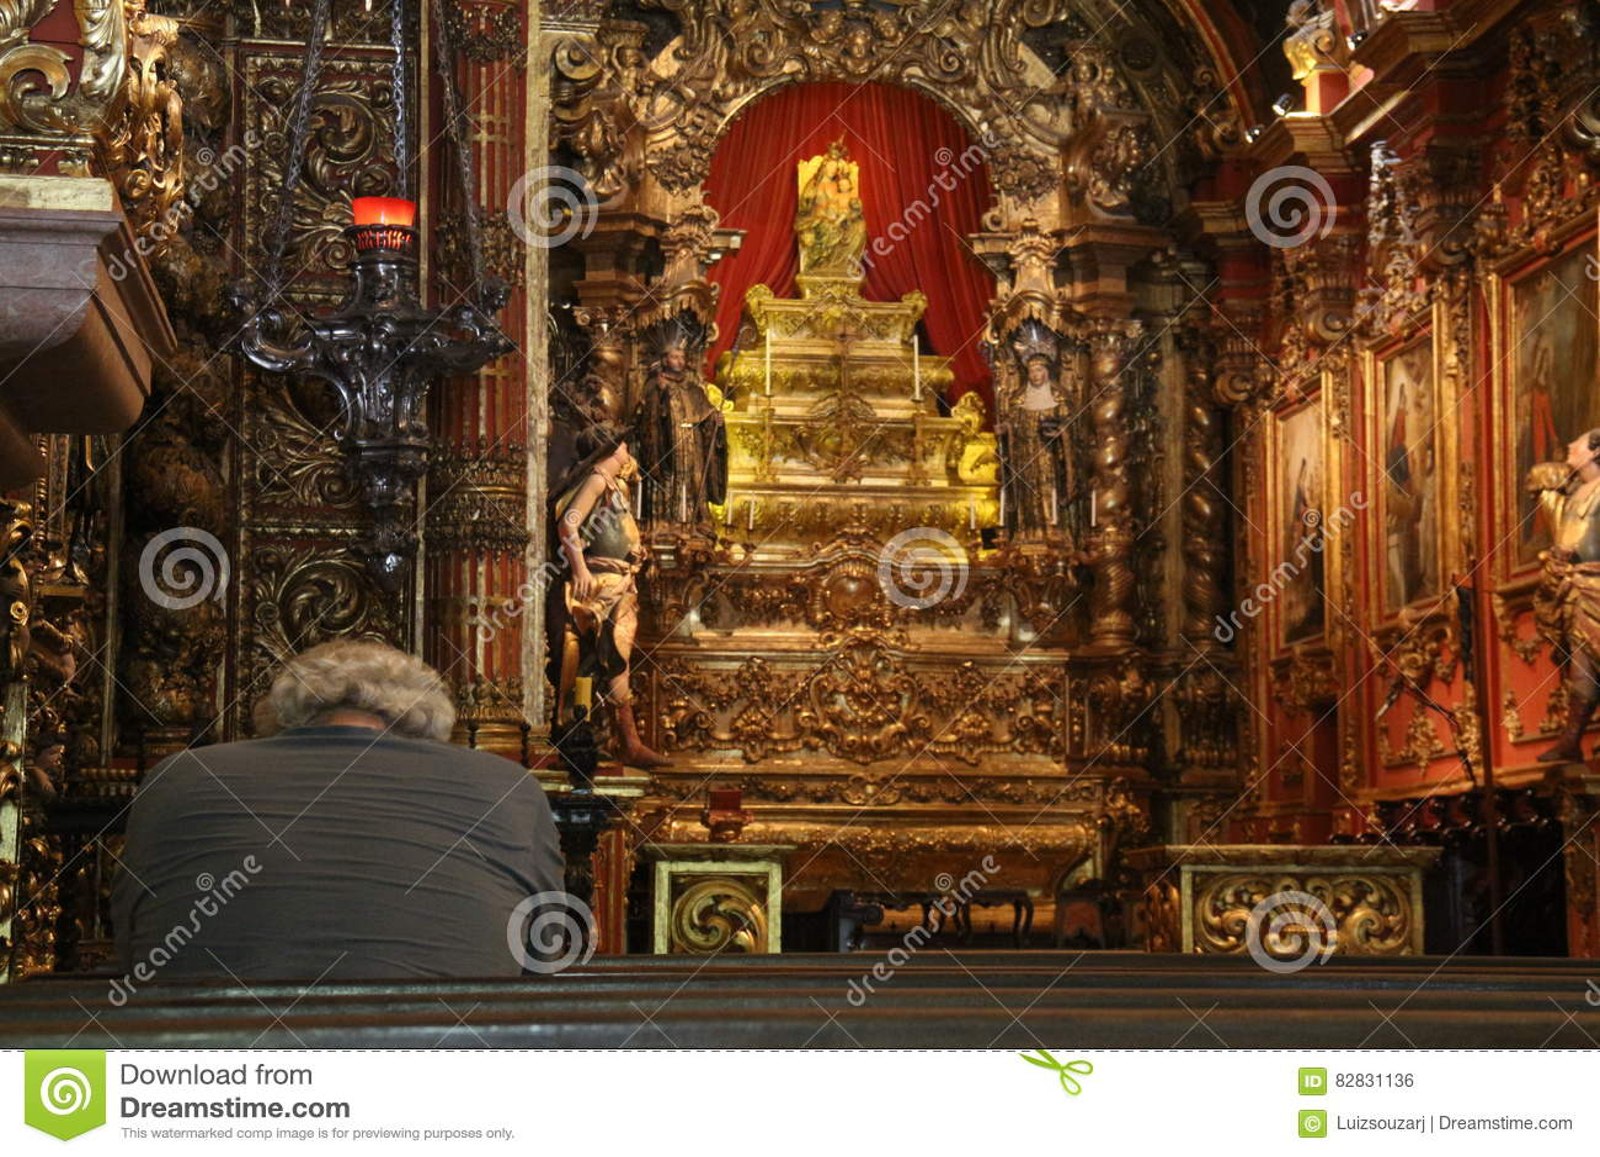 Religious Tourism in Rio de Janeiro Downtown